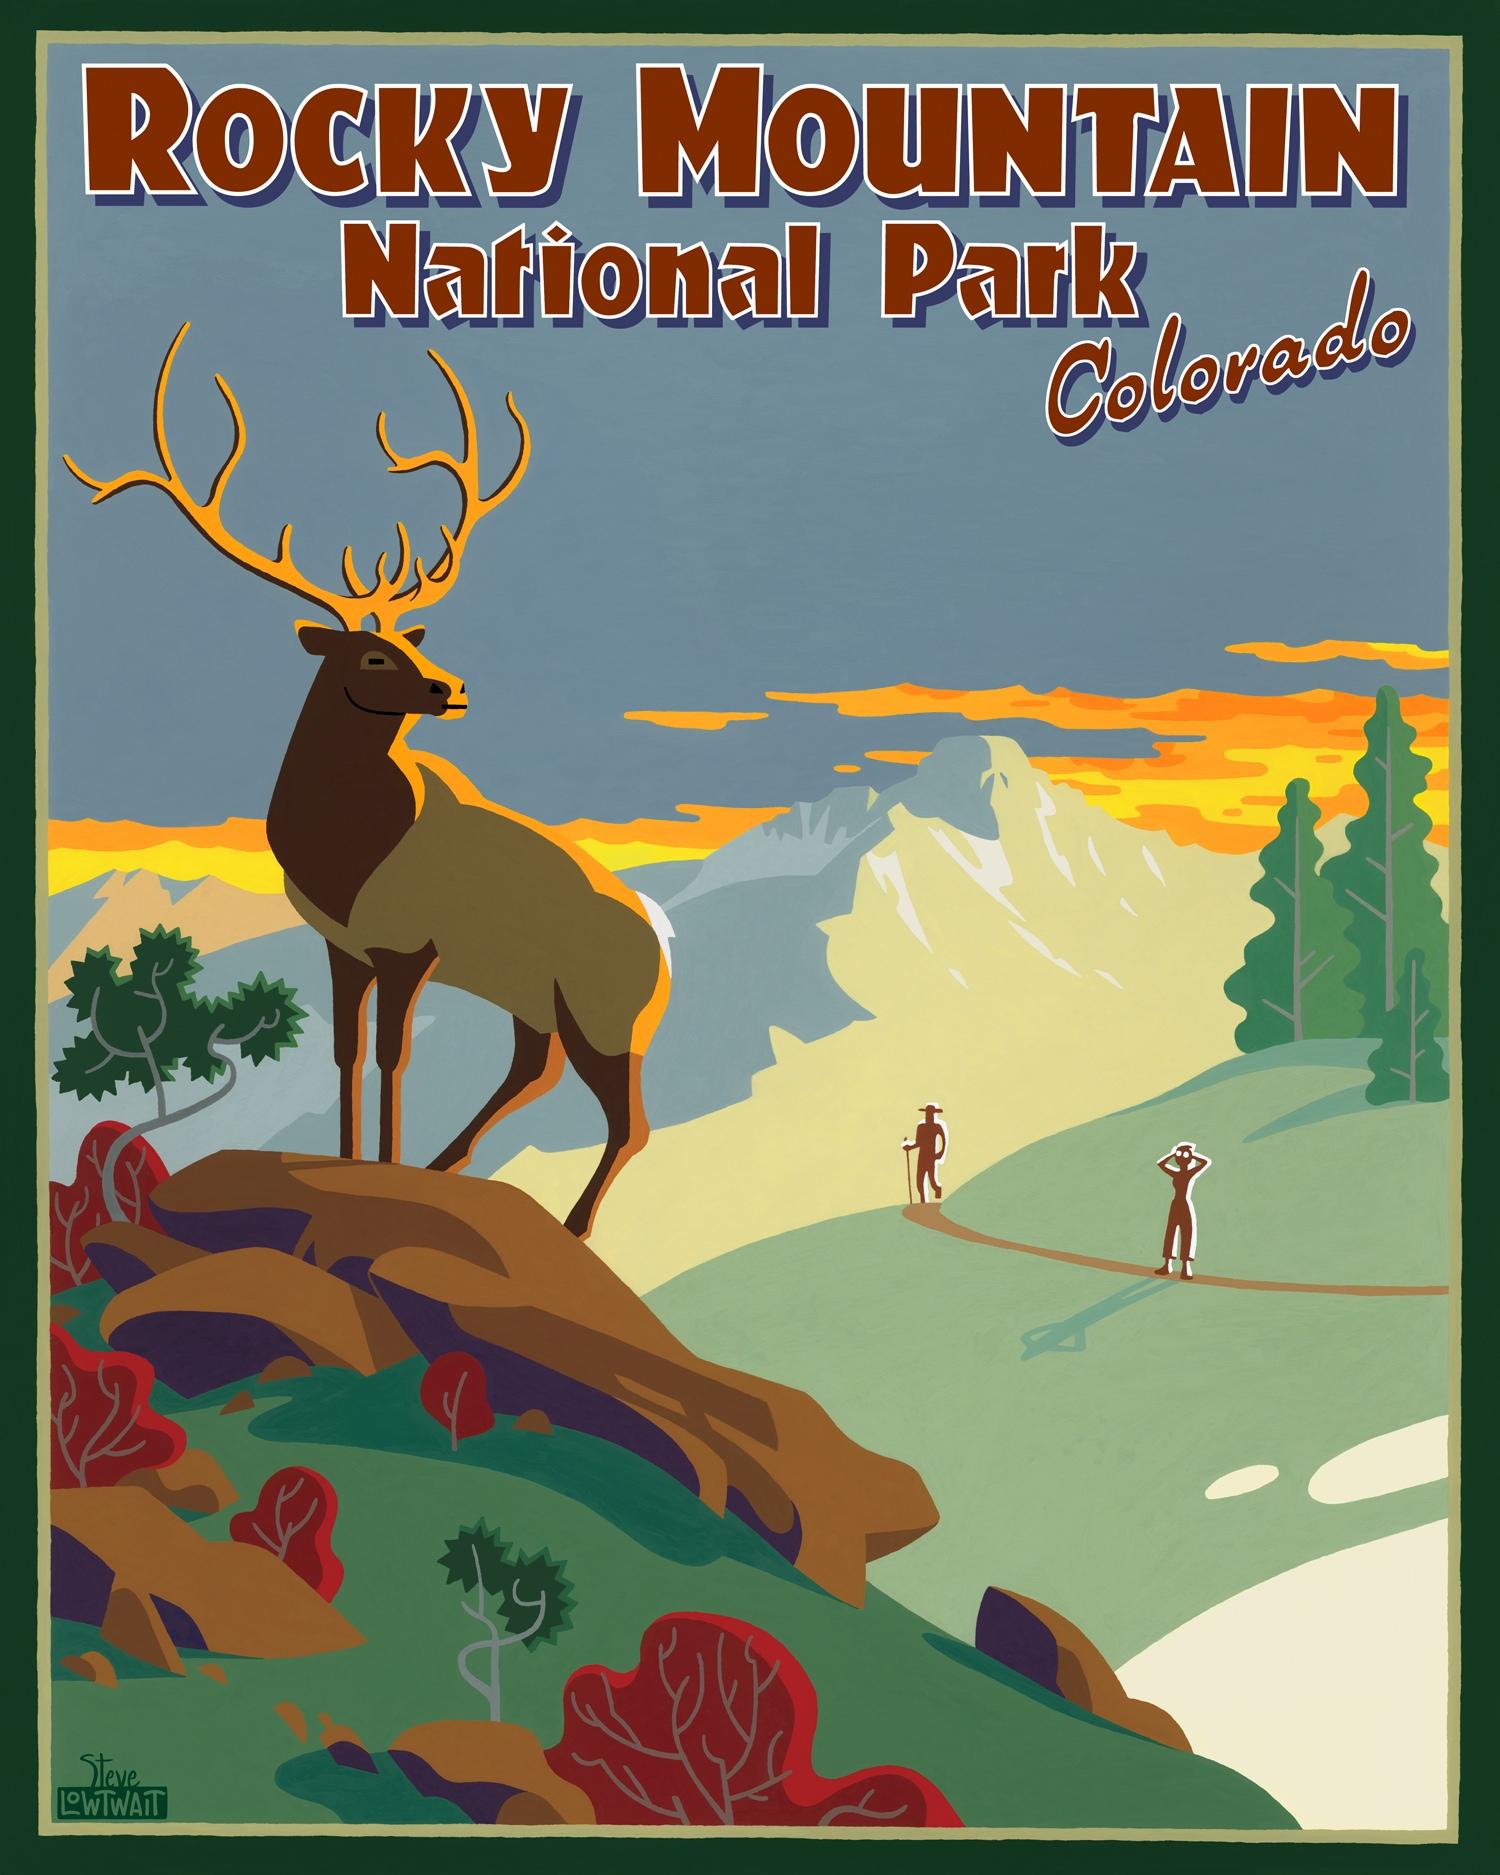 Rocky_Mountain_National_Park_Colorado.jpg